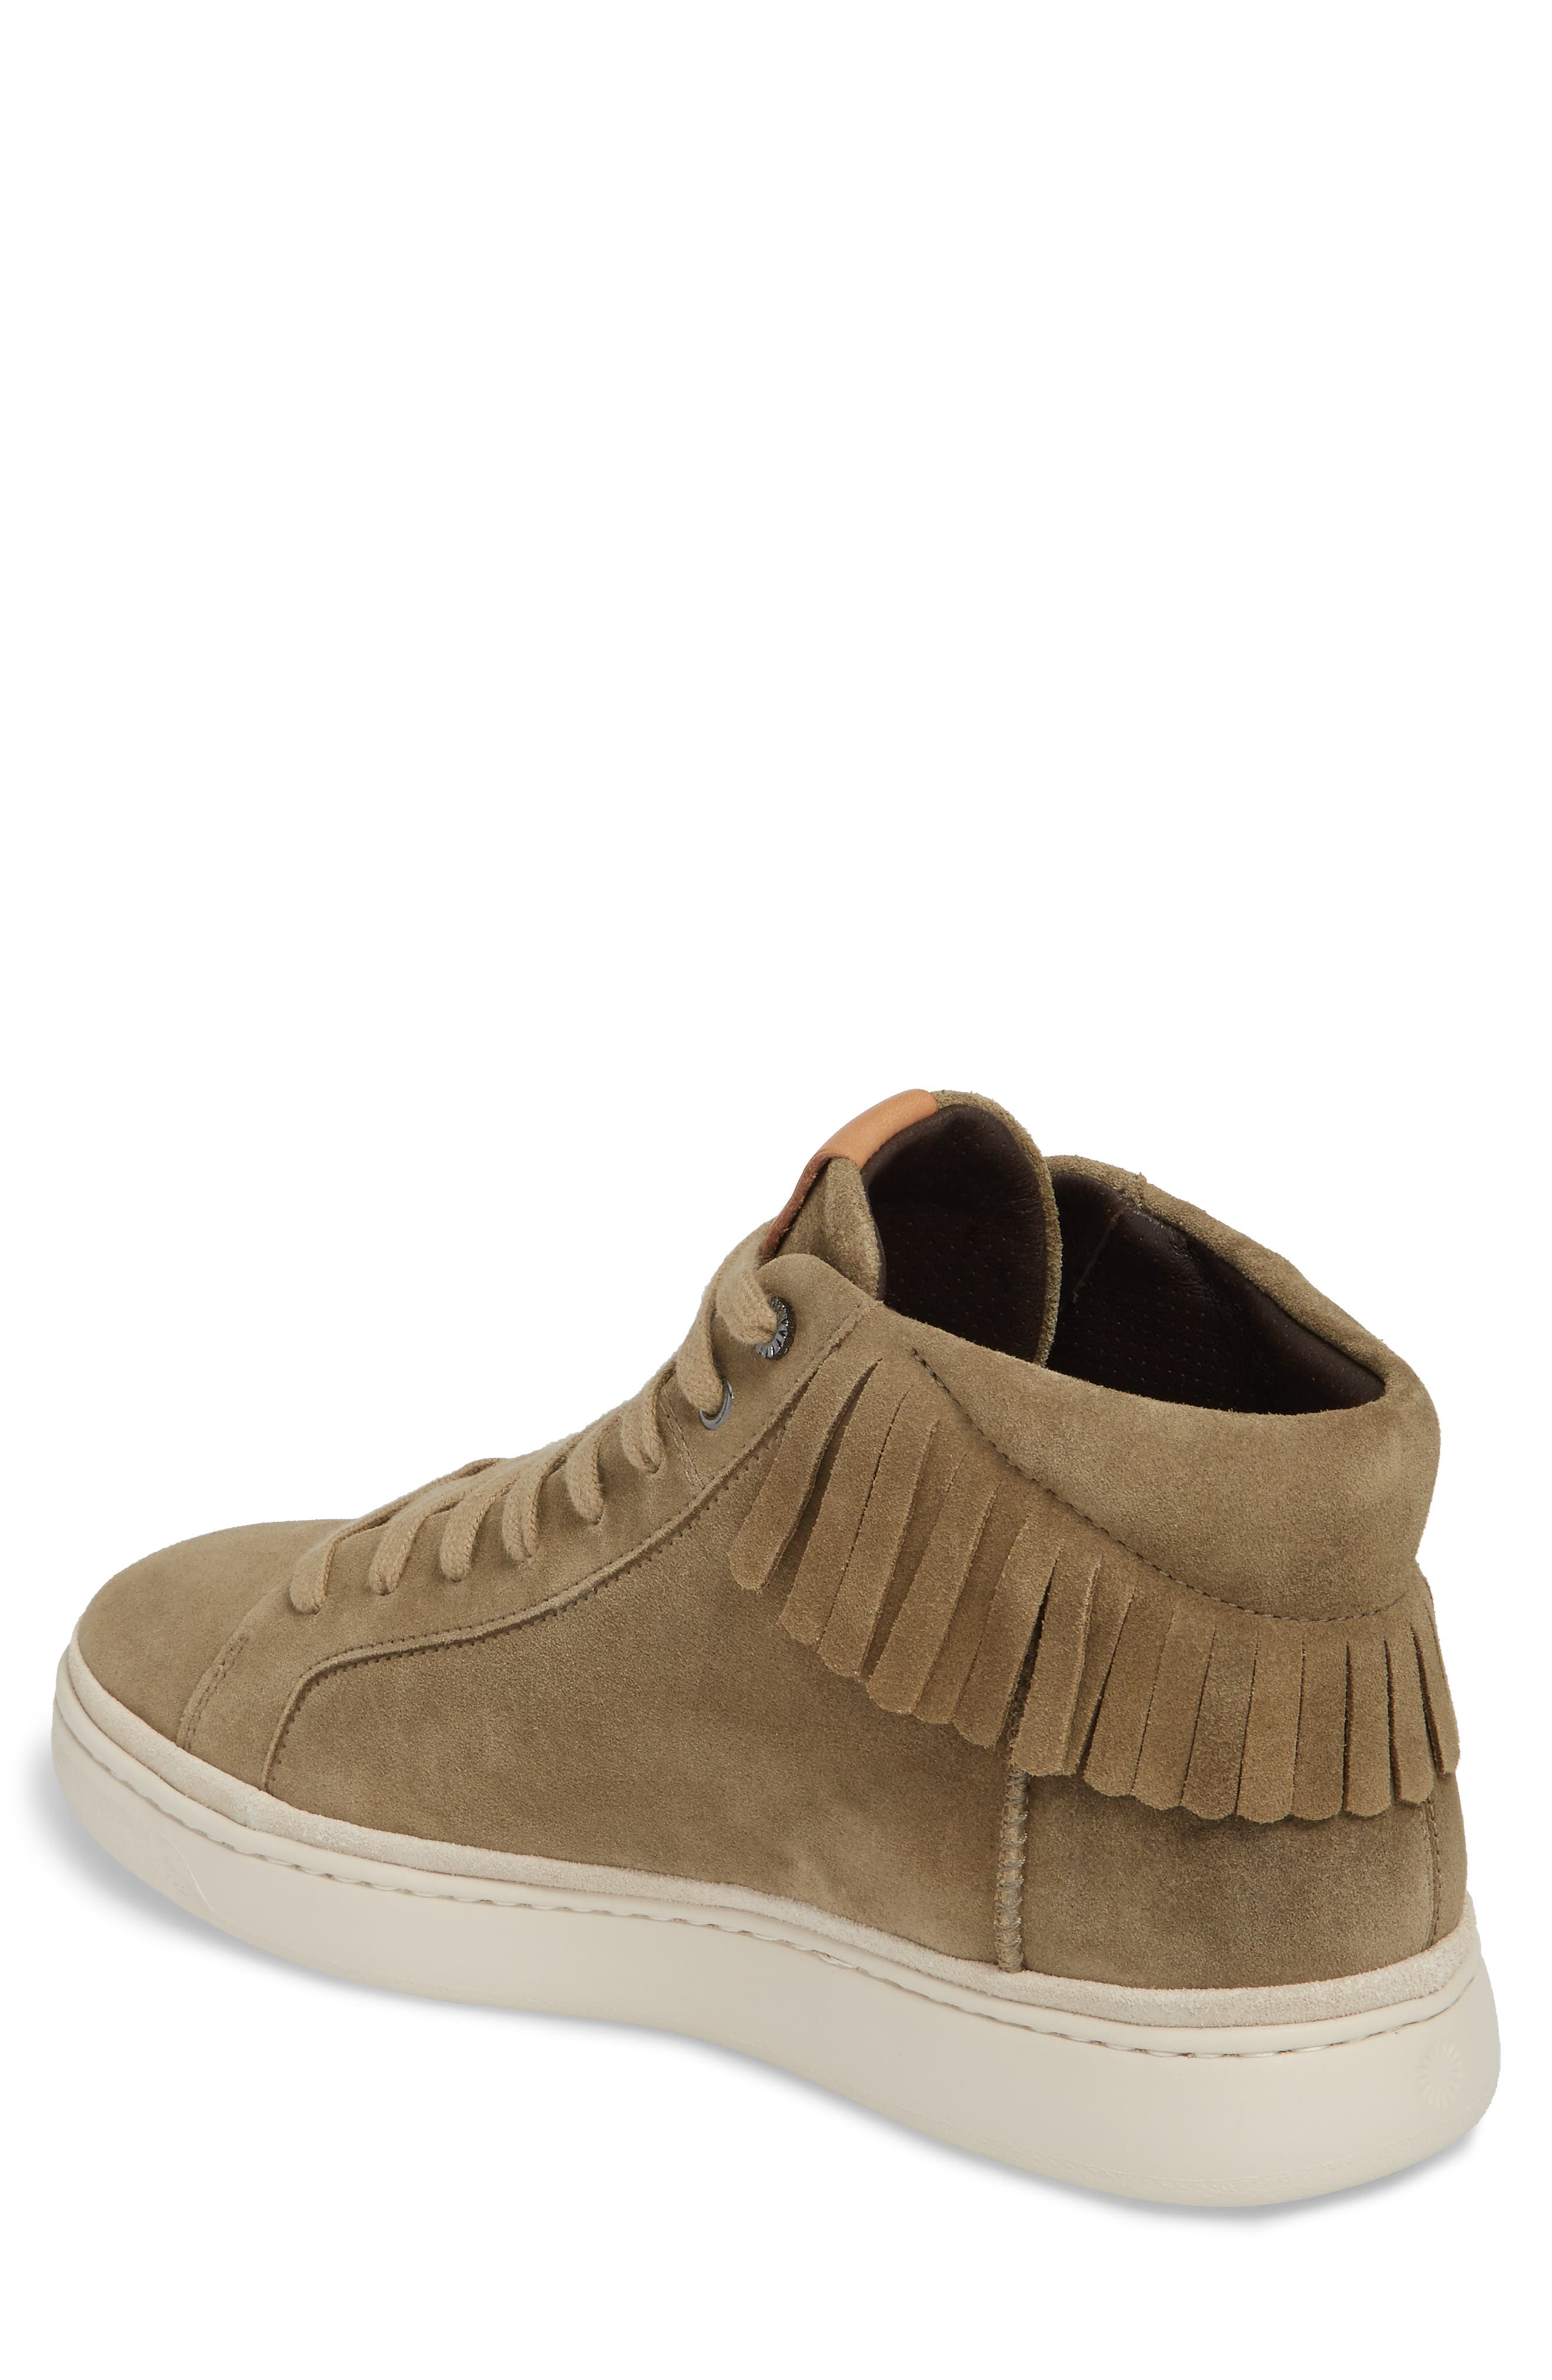 Brecken Fringe High-Top Sneaker,                             Alternate thumbnail 2, color,                             204